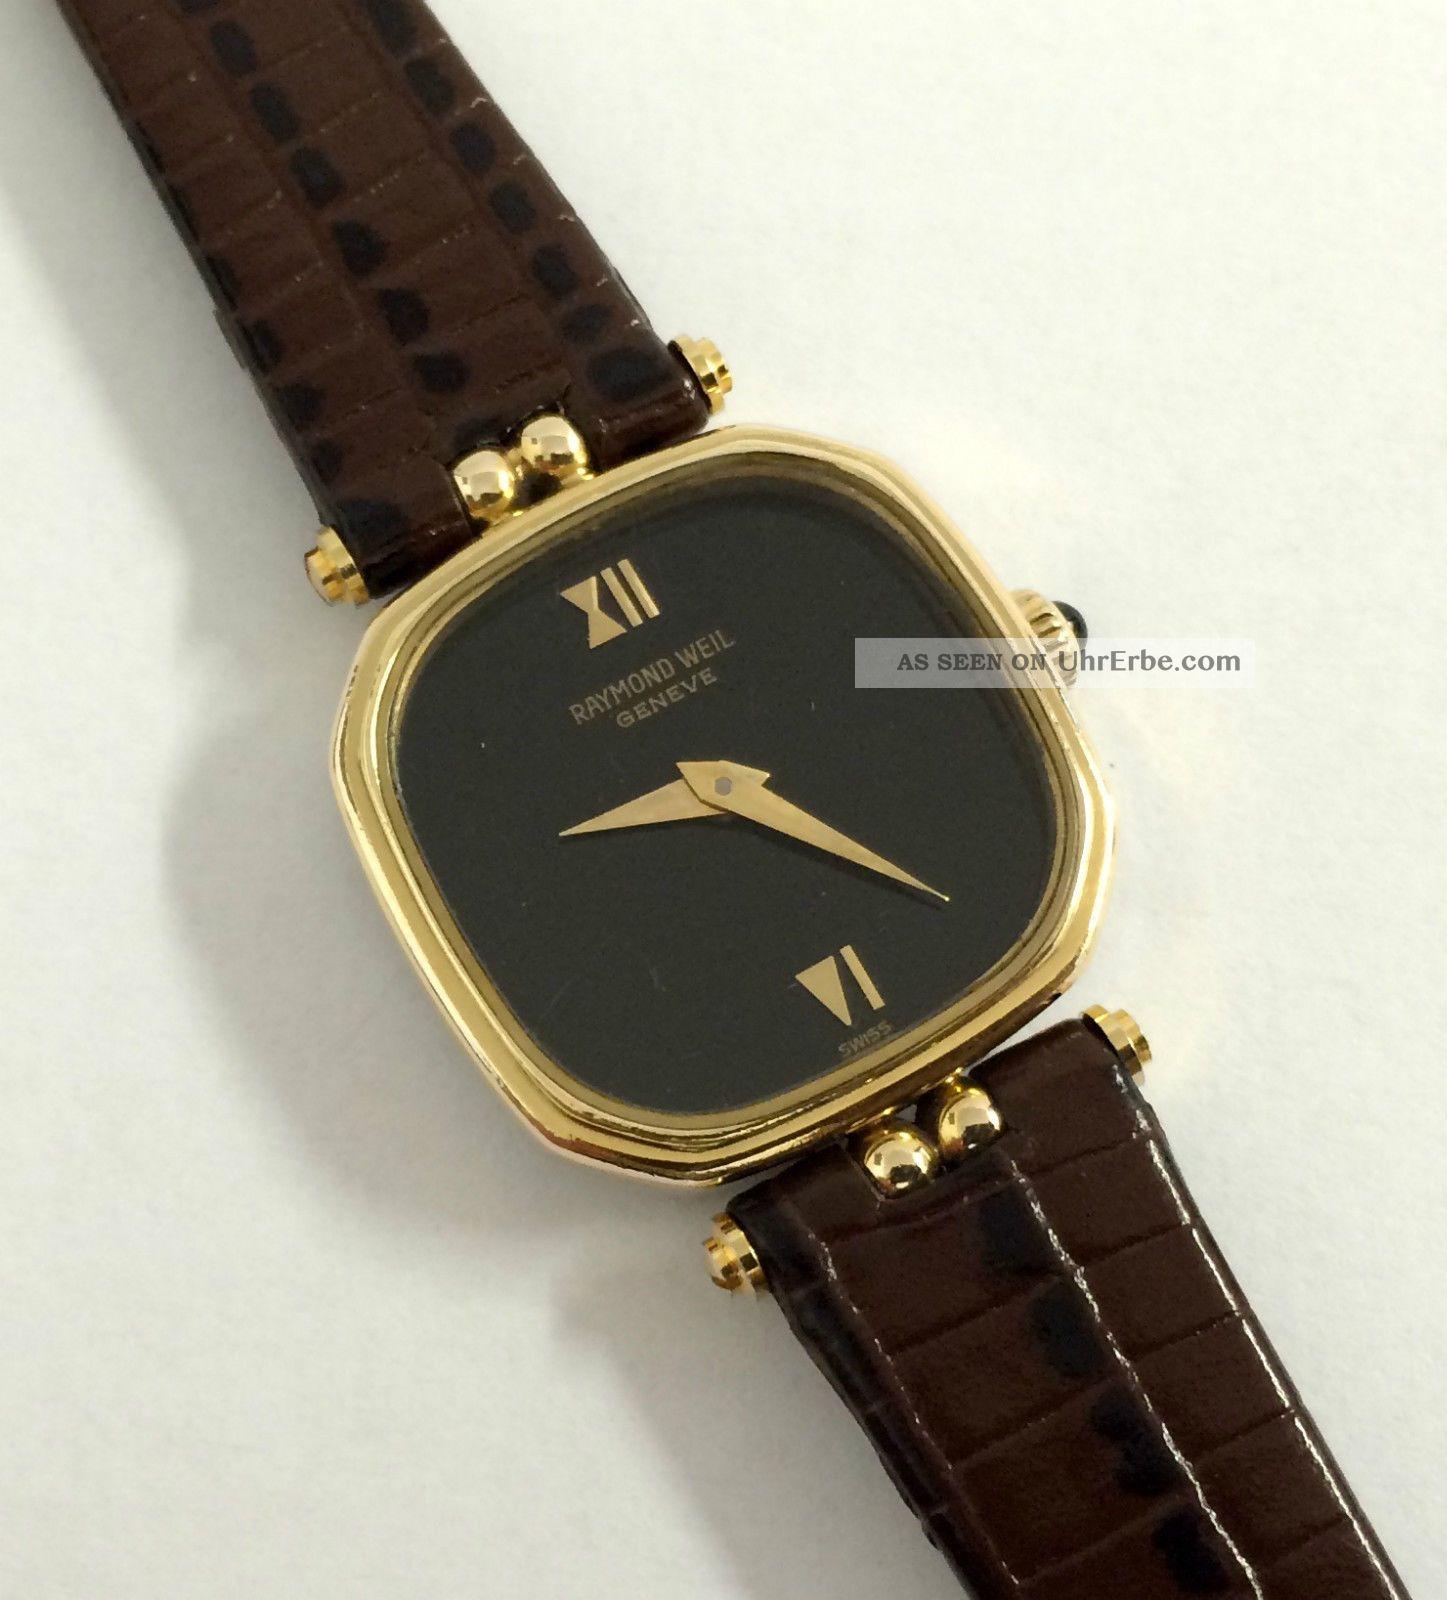 Vintage Raymond Weil Geneve Handaufzug Damen Armbanduhr,  Eta Werk Cal.  2512 - 1. Armbanduhren Bild